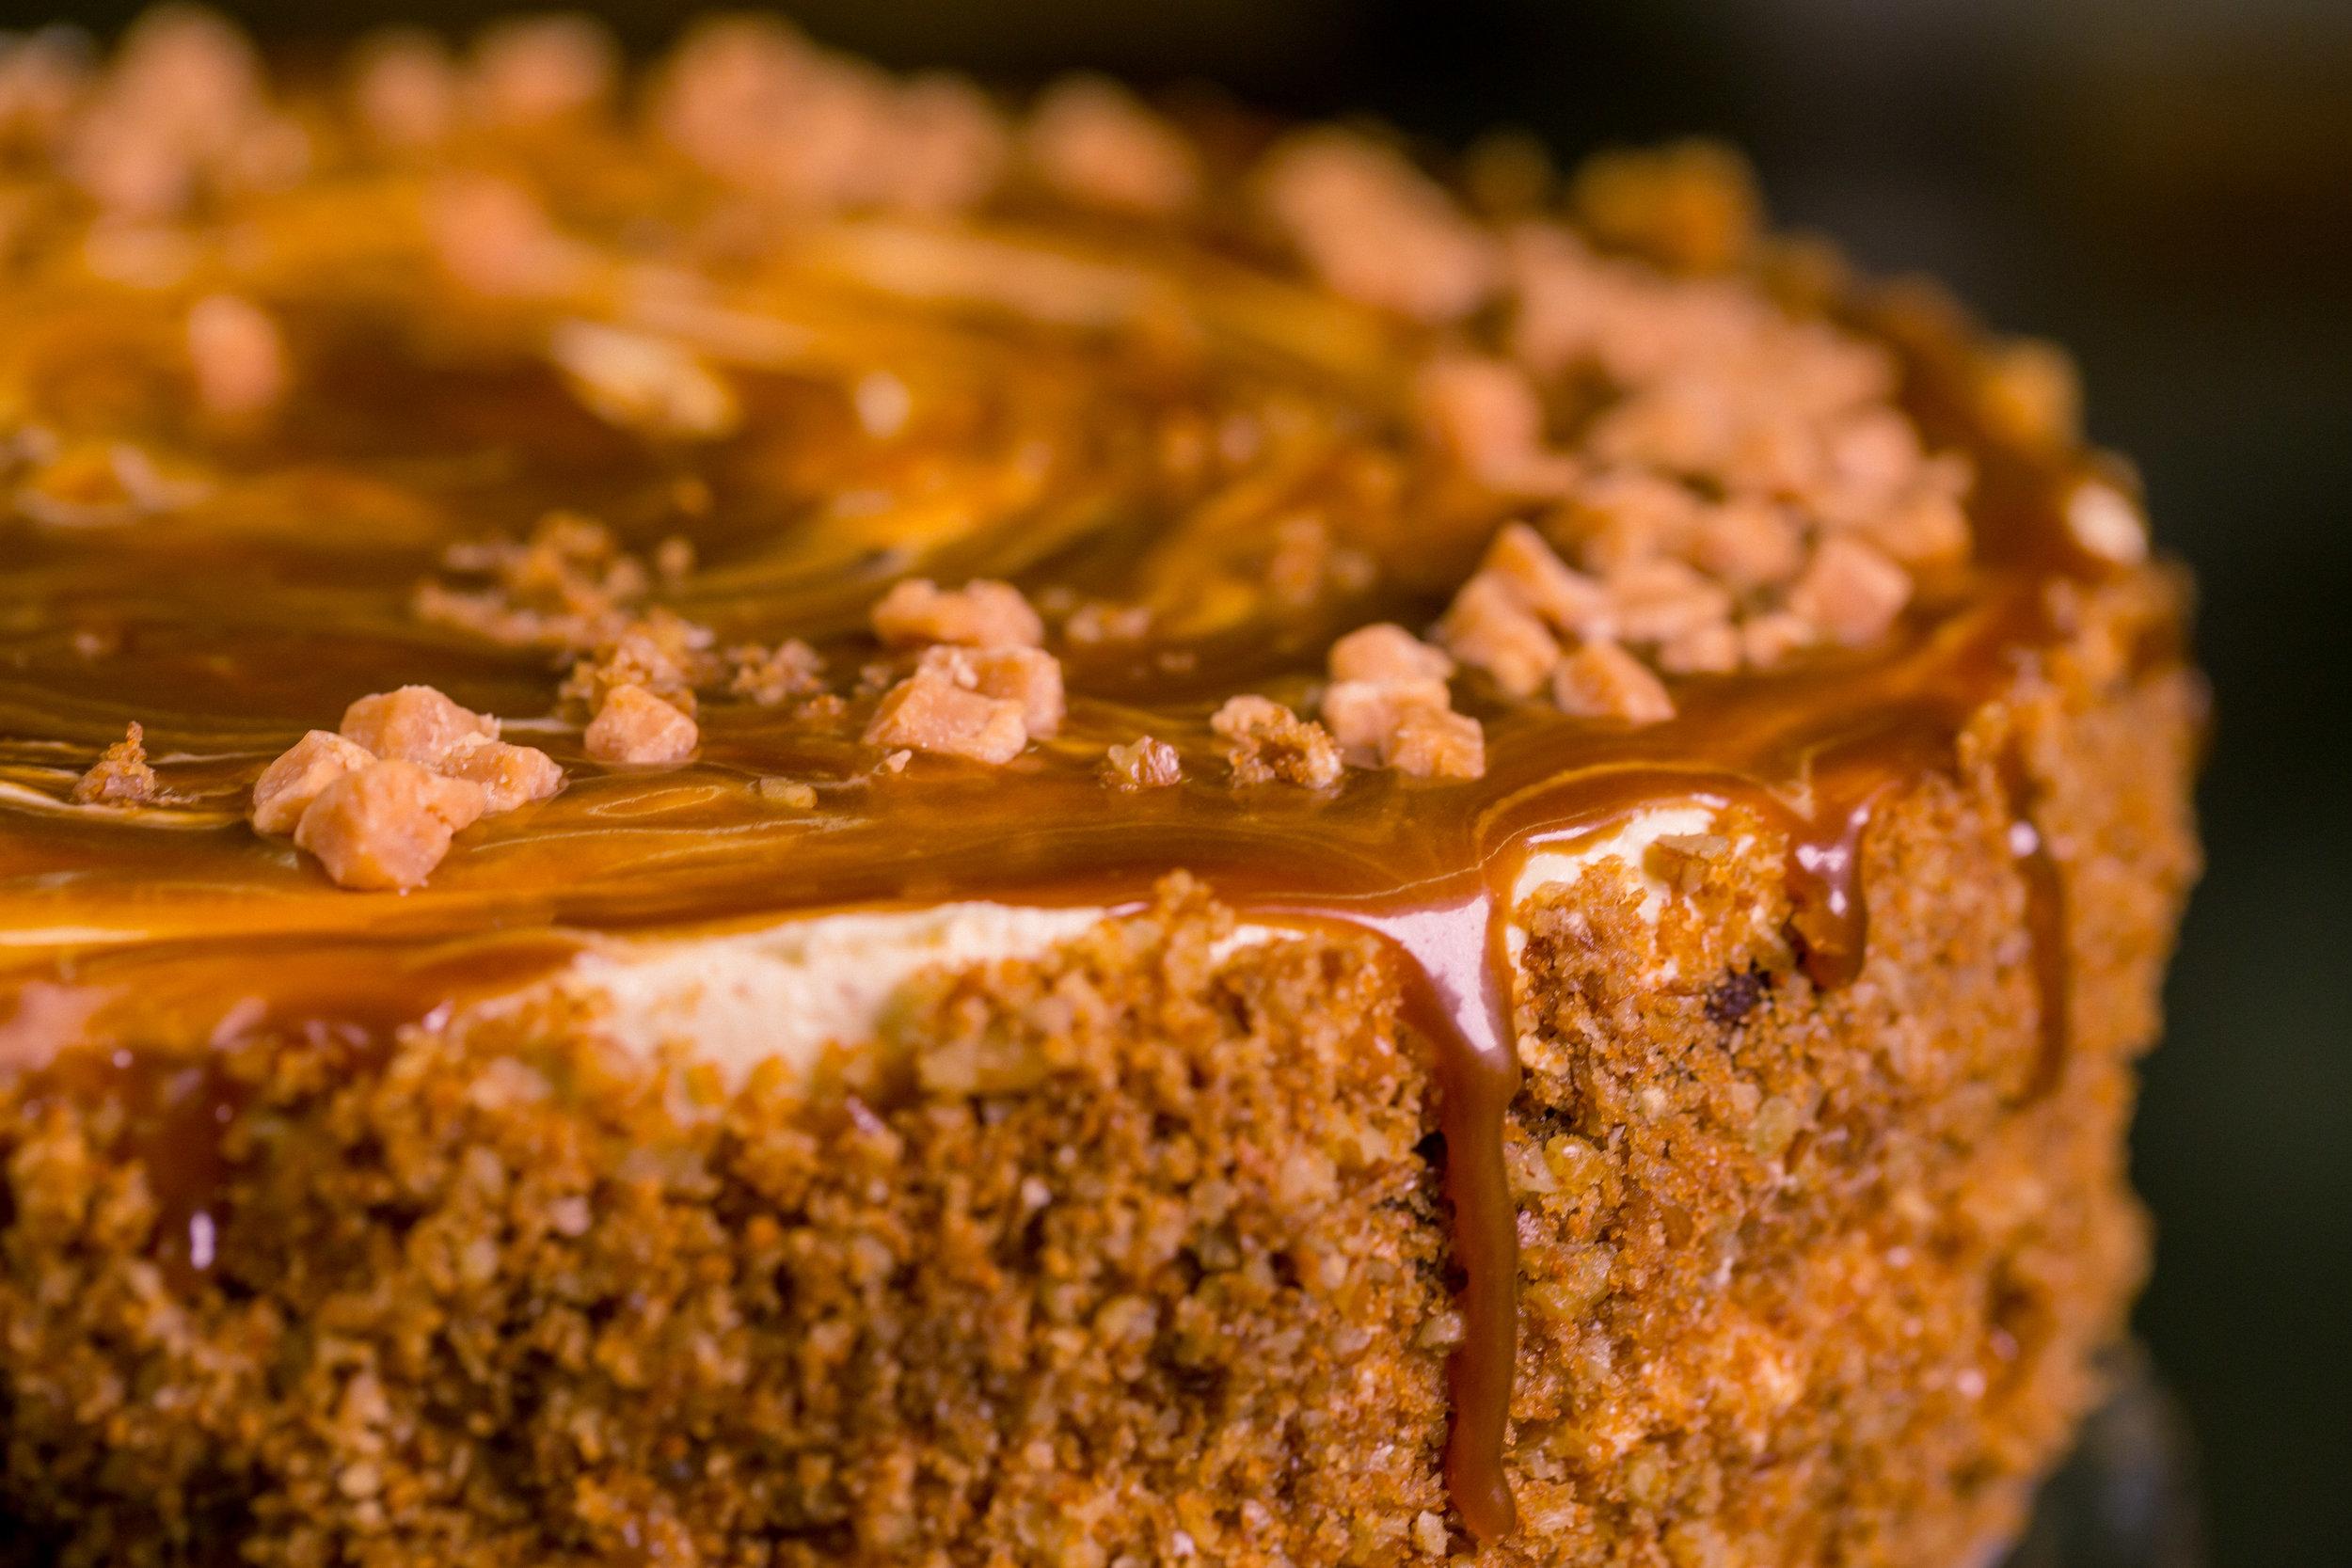 Rummanco Cake Details 14.jpg